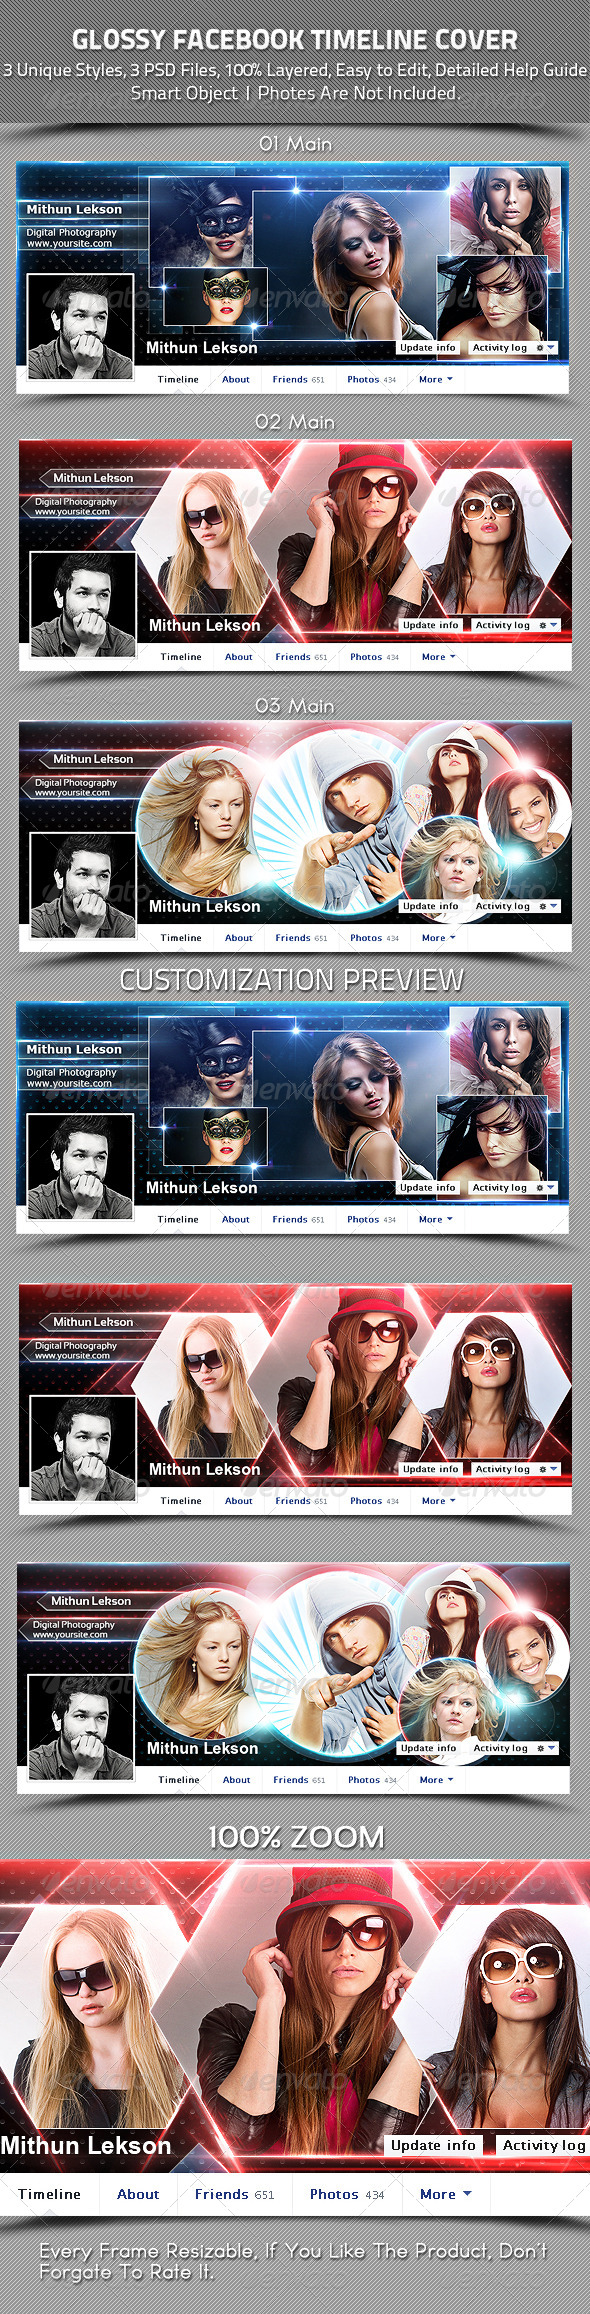 Glossy Facebook Timeline Cover - Facebook Timeline Covers Social Media